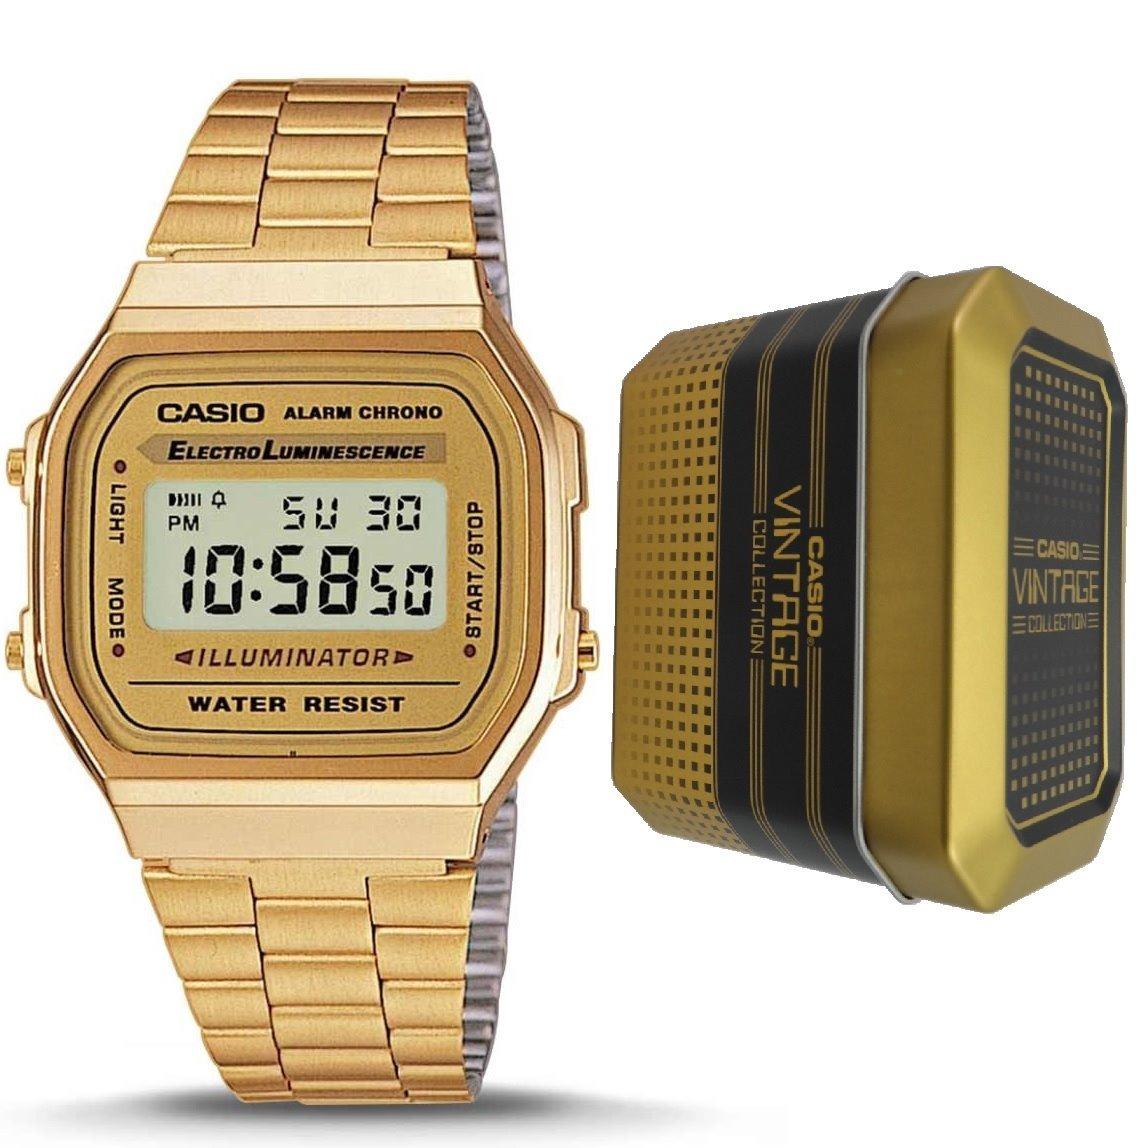 bb255dad250b Reloj Casio Retro Dorado Vintage A168wg-9w Original Unisex ...